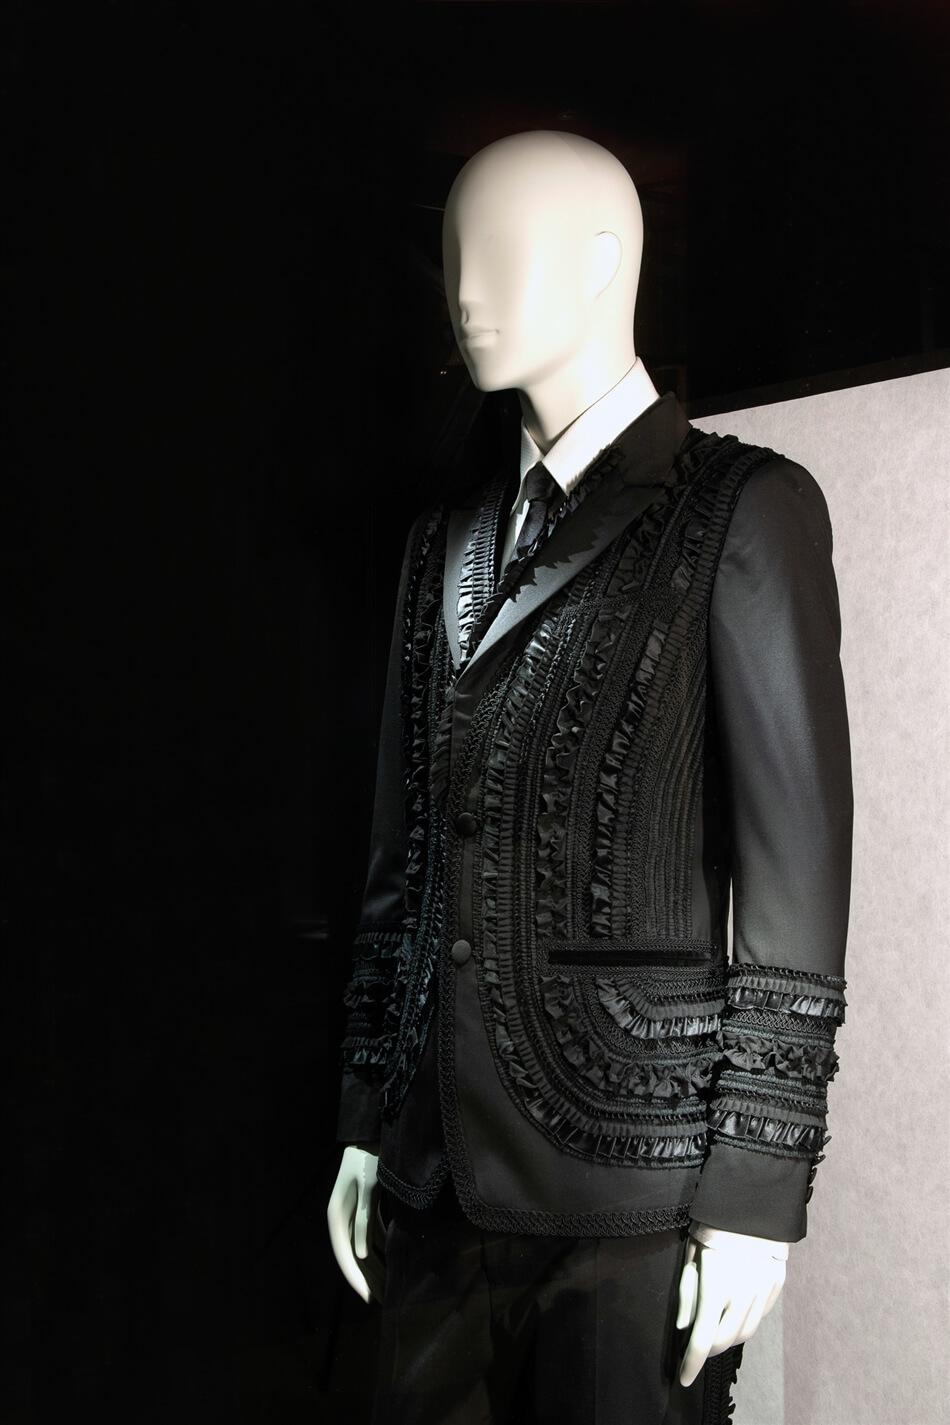 Masculinities Fashionlacemuseum Brussel 009